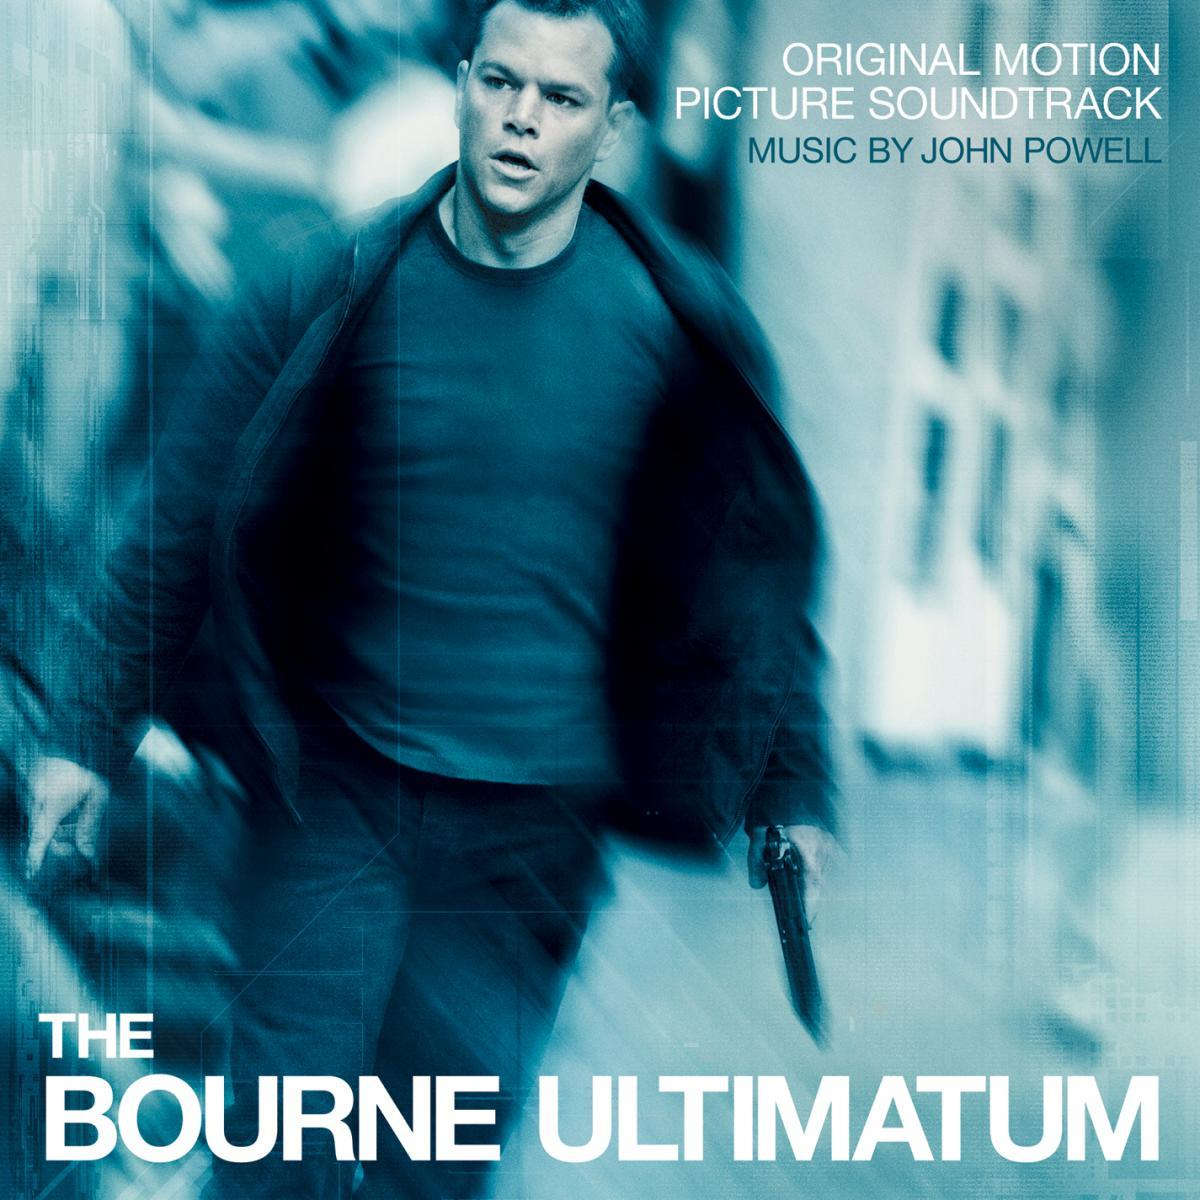 El Ultimatum De Bourne 2007 Filmaffinity